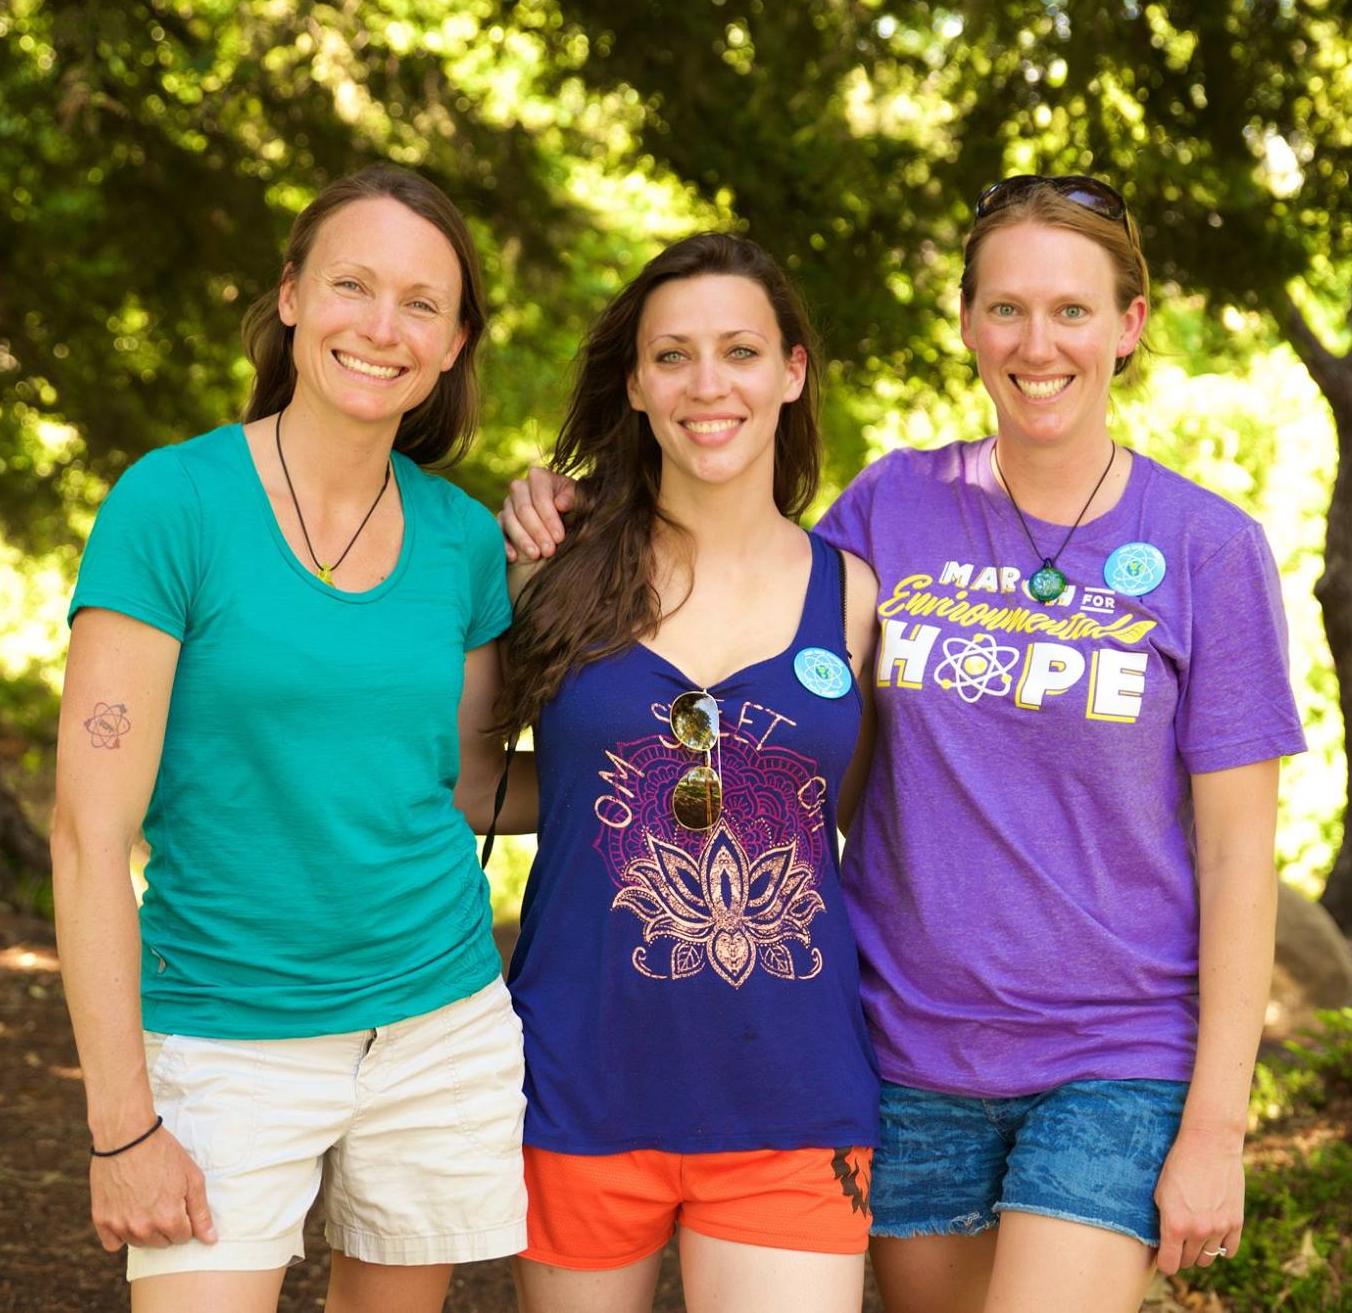 Kristin Zaitz (Diablo Canyon, CA), Sarah Spath (Ginna, NY) and Heather Matteson (Diablo Canyon, CA) on the March for Environmental Hope! June 24 - 28, 2016